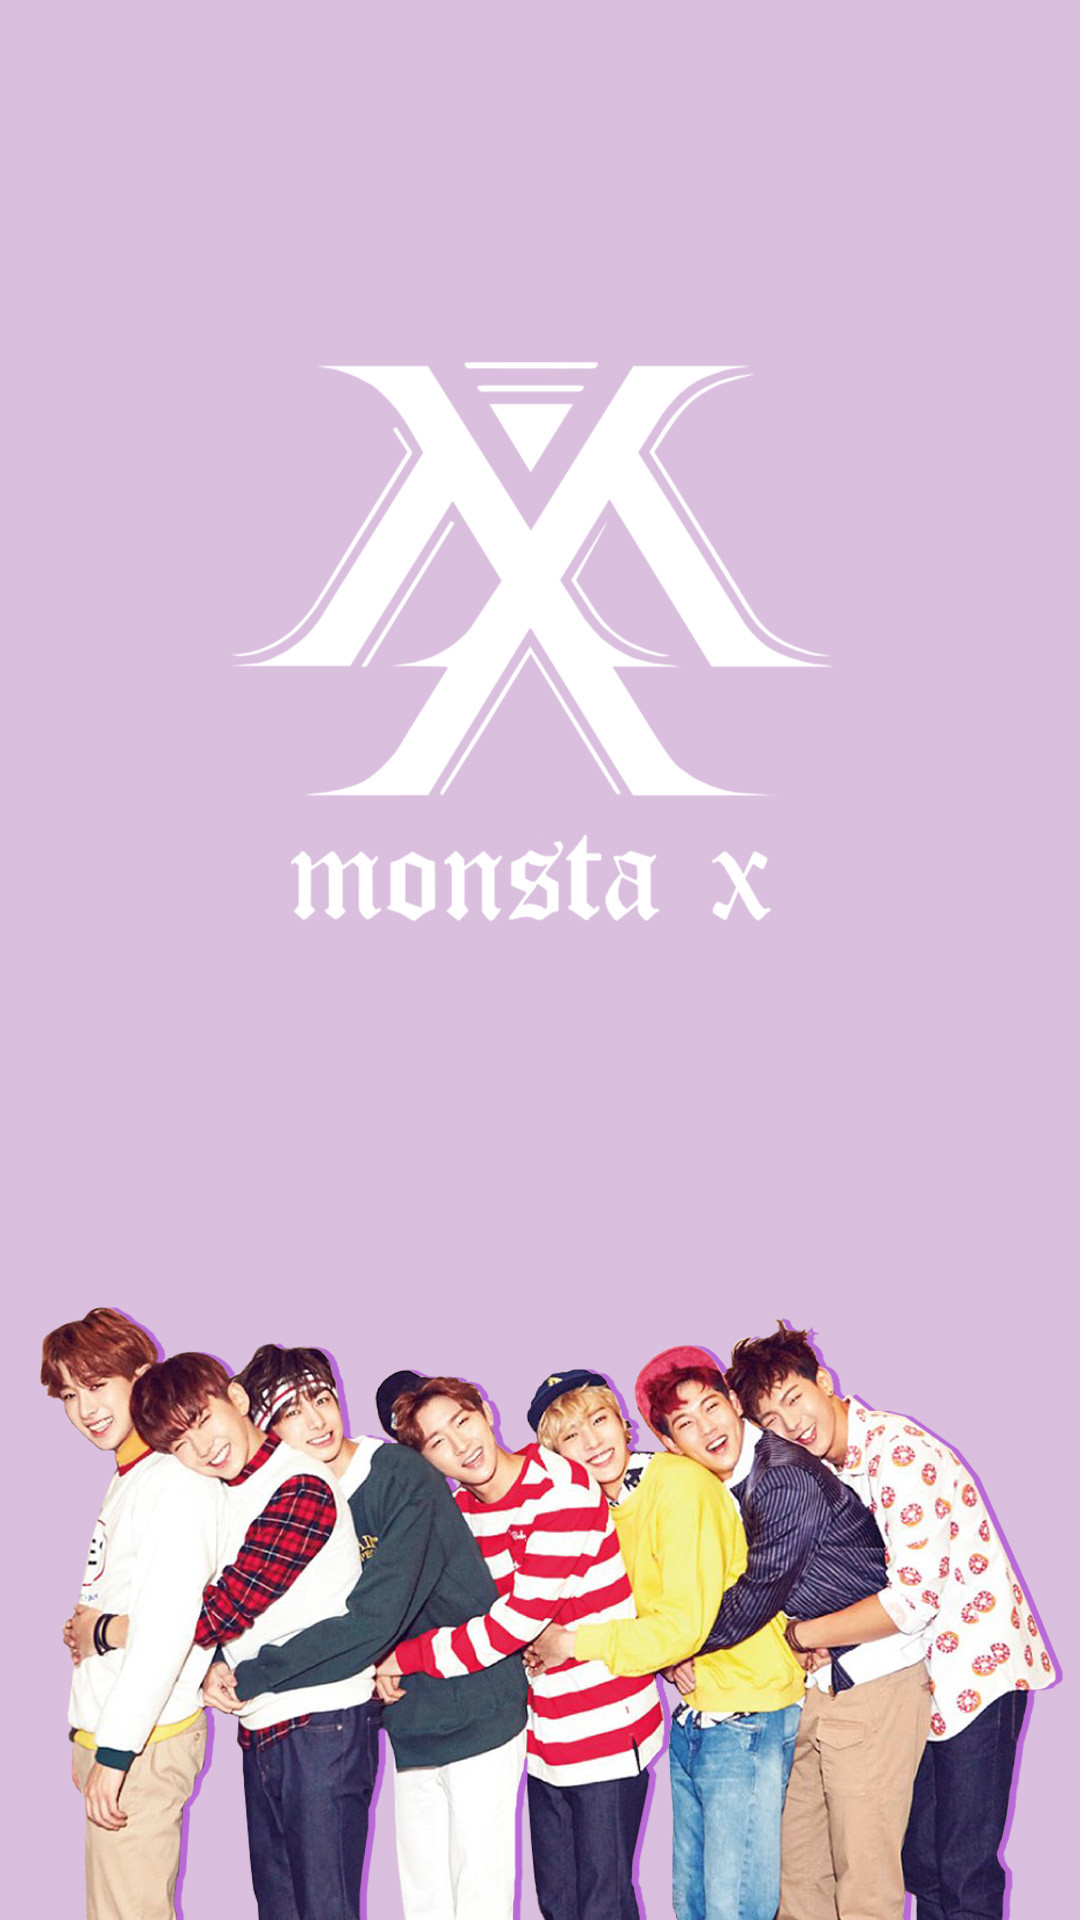 97 Monsta X Wonho Wallpapers On Wallpapersafari